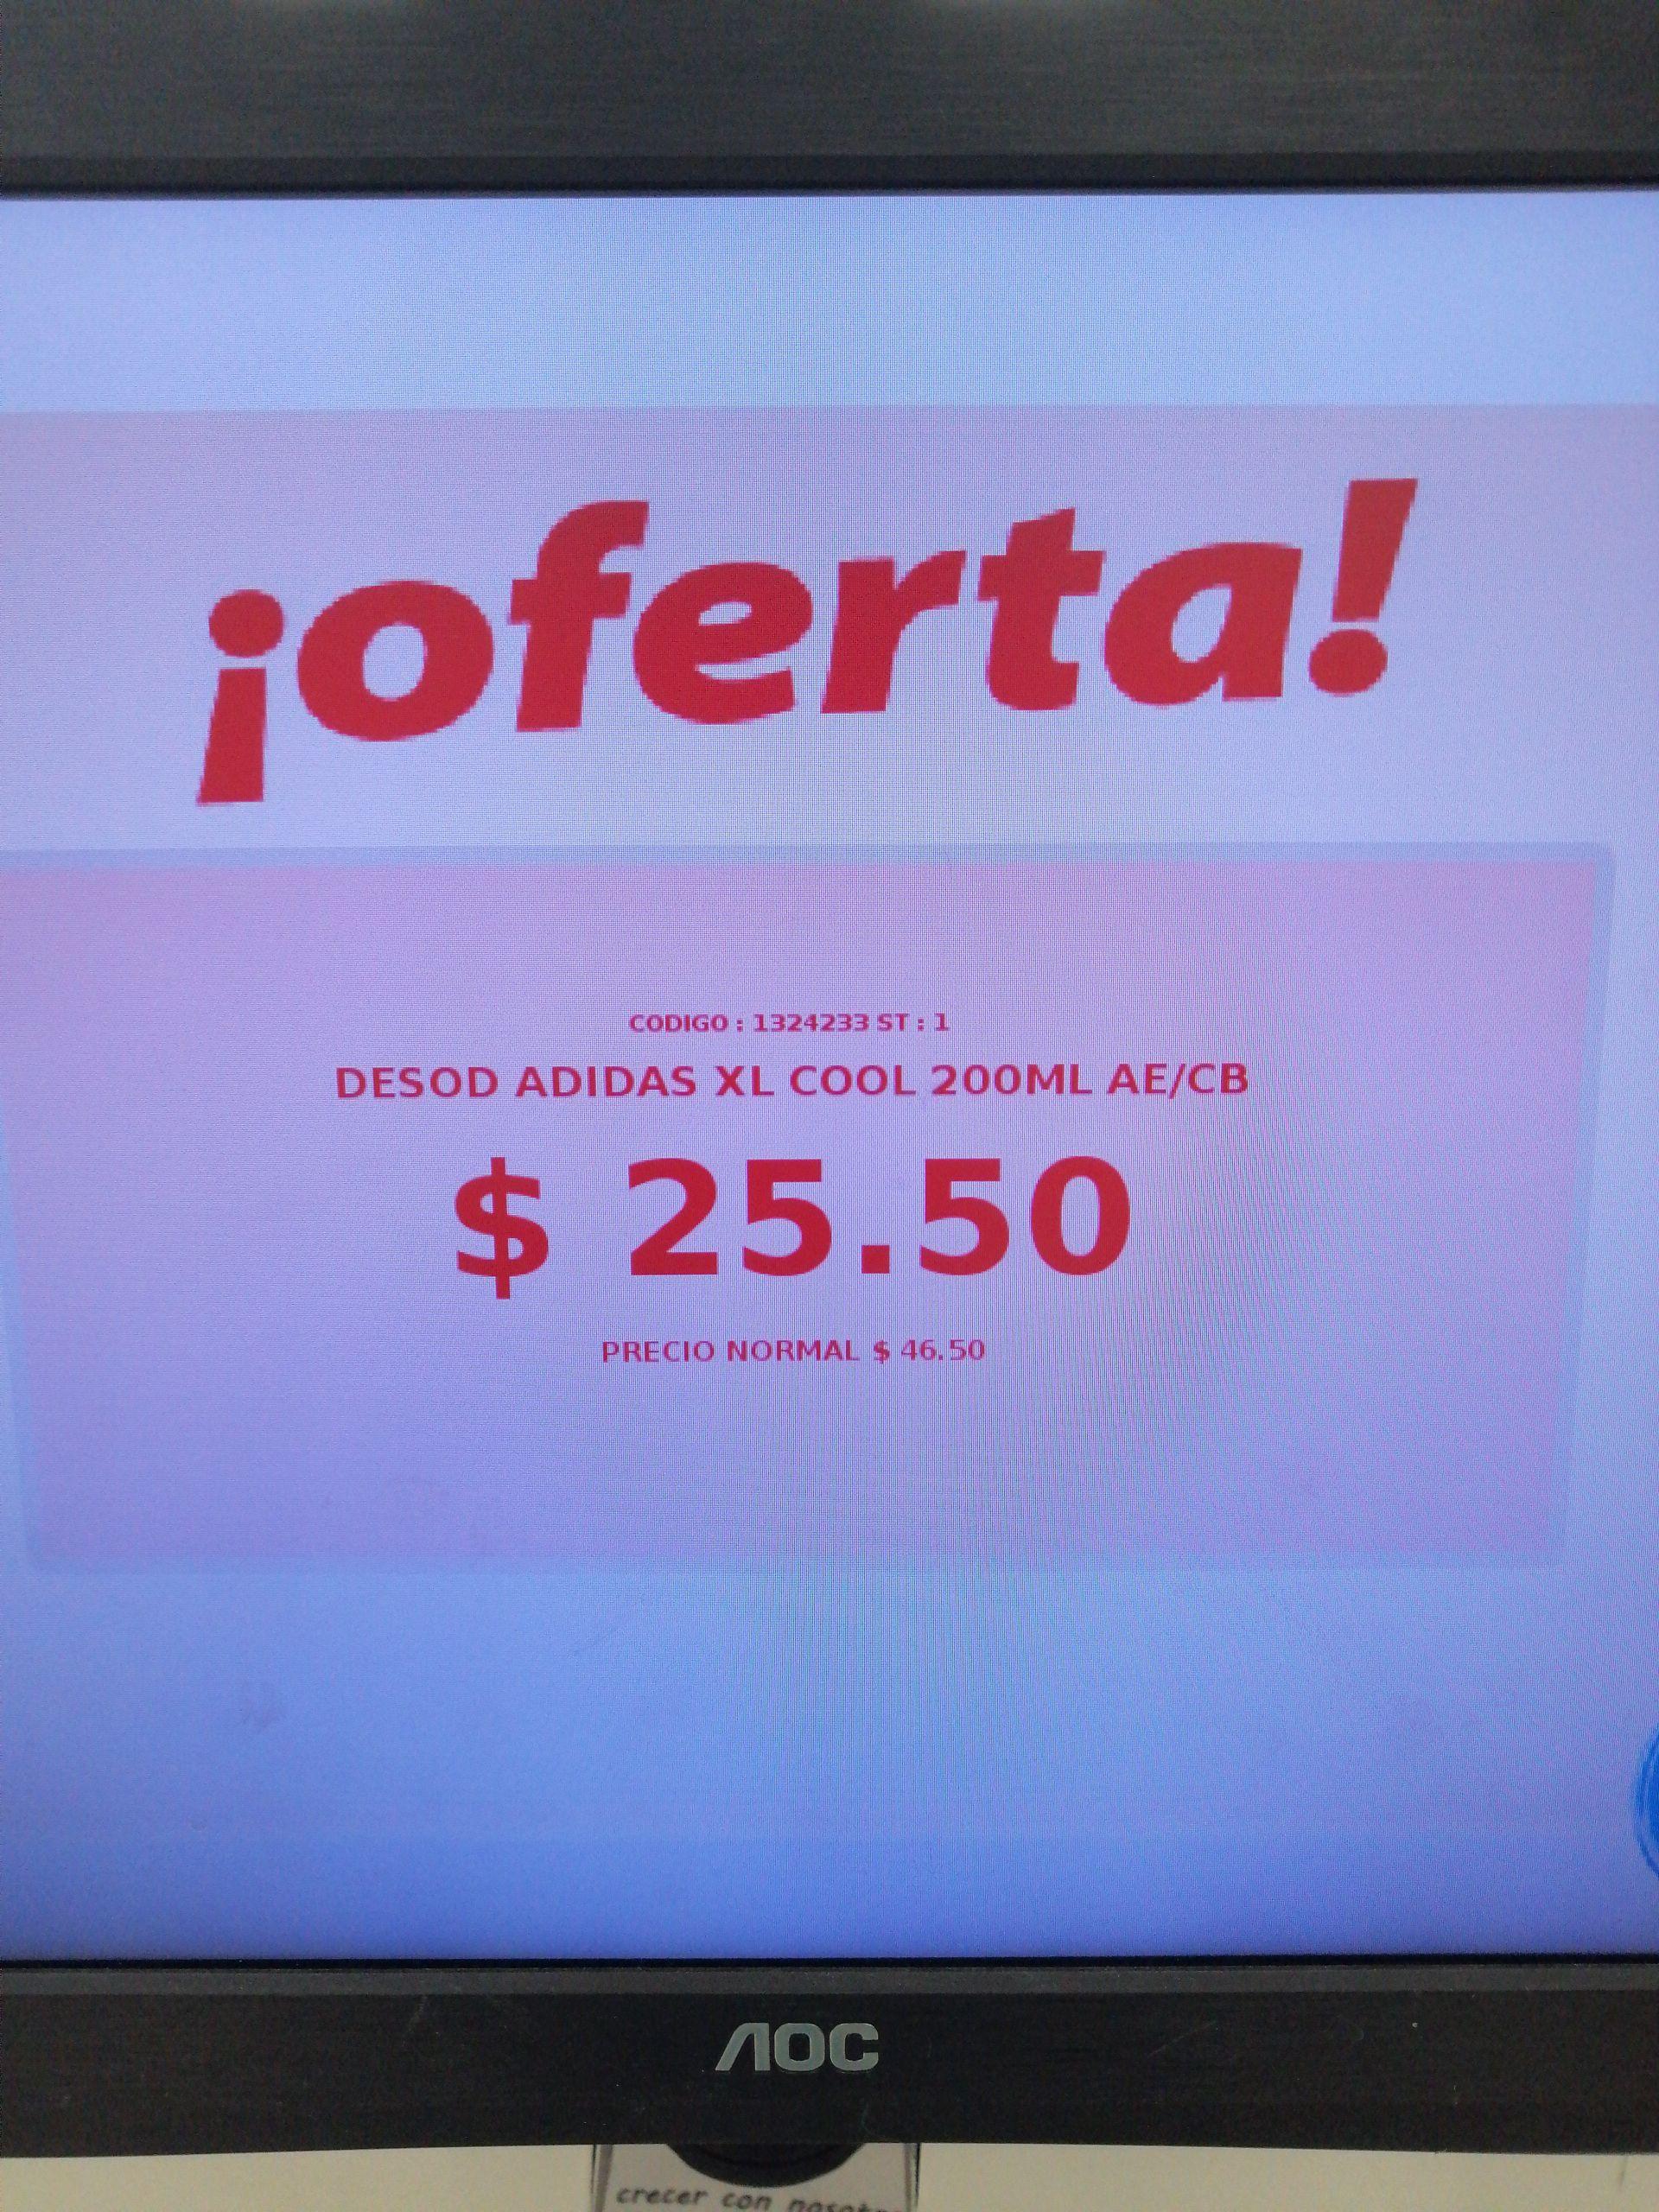 Farmacias Guadalajara: Desodorante Adidas XL 200 ml